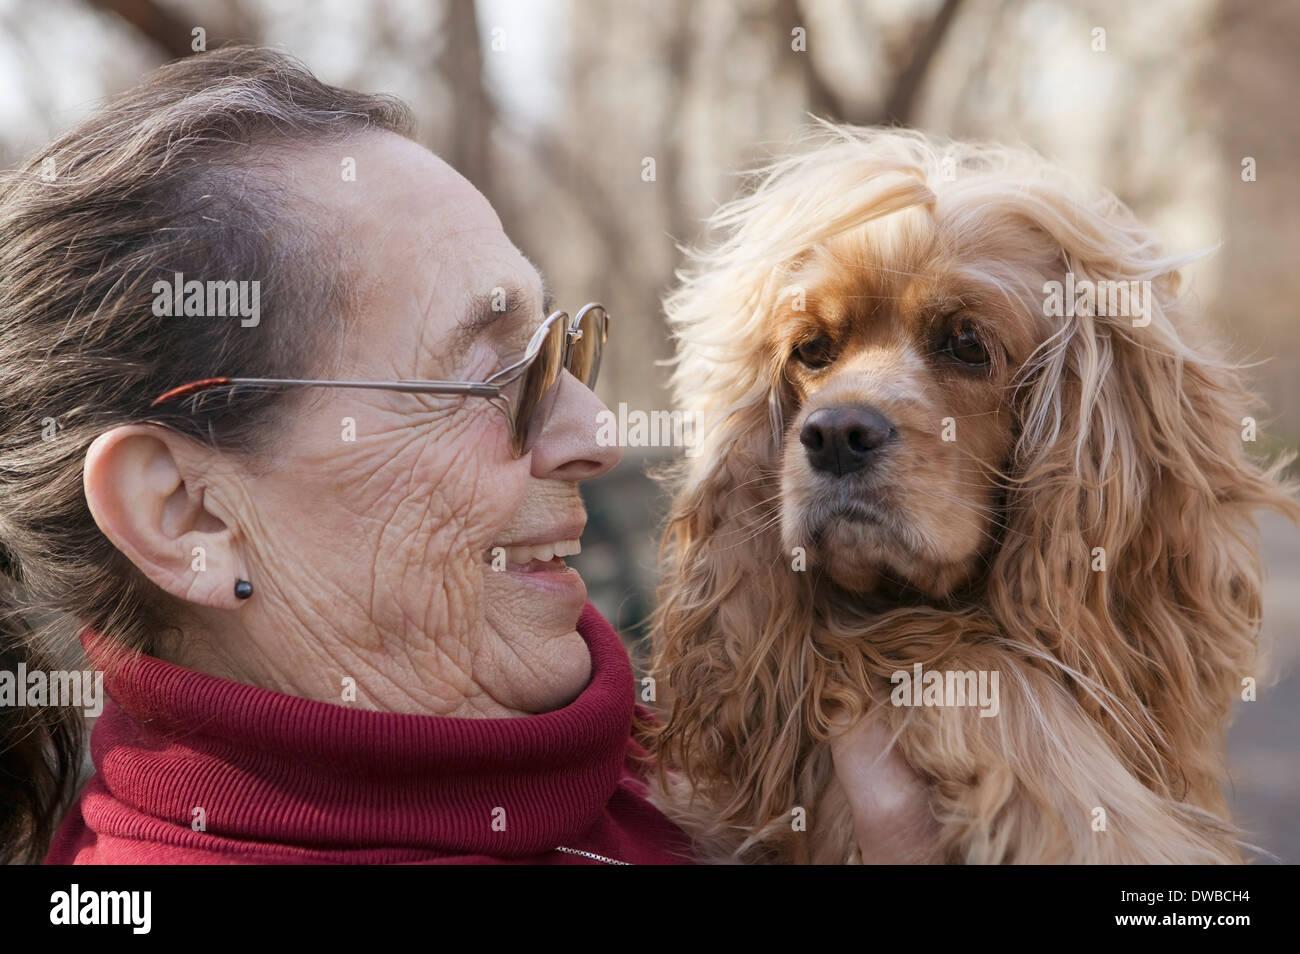 Senior woman with dog - Stock Image